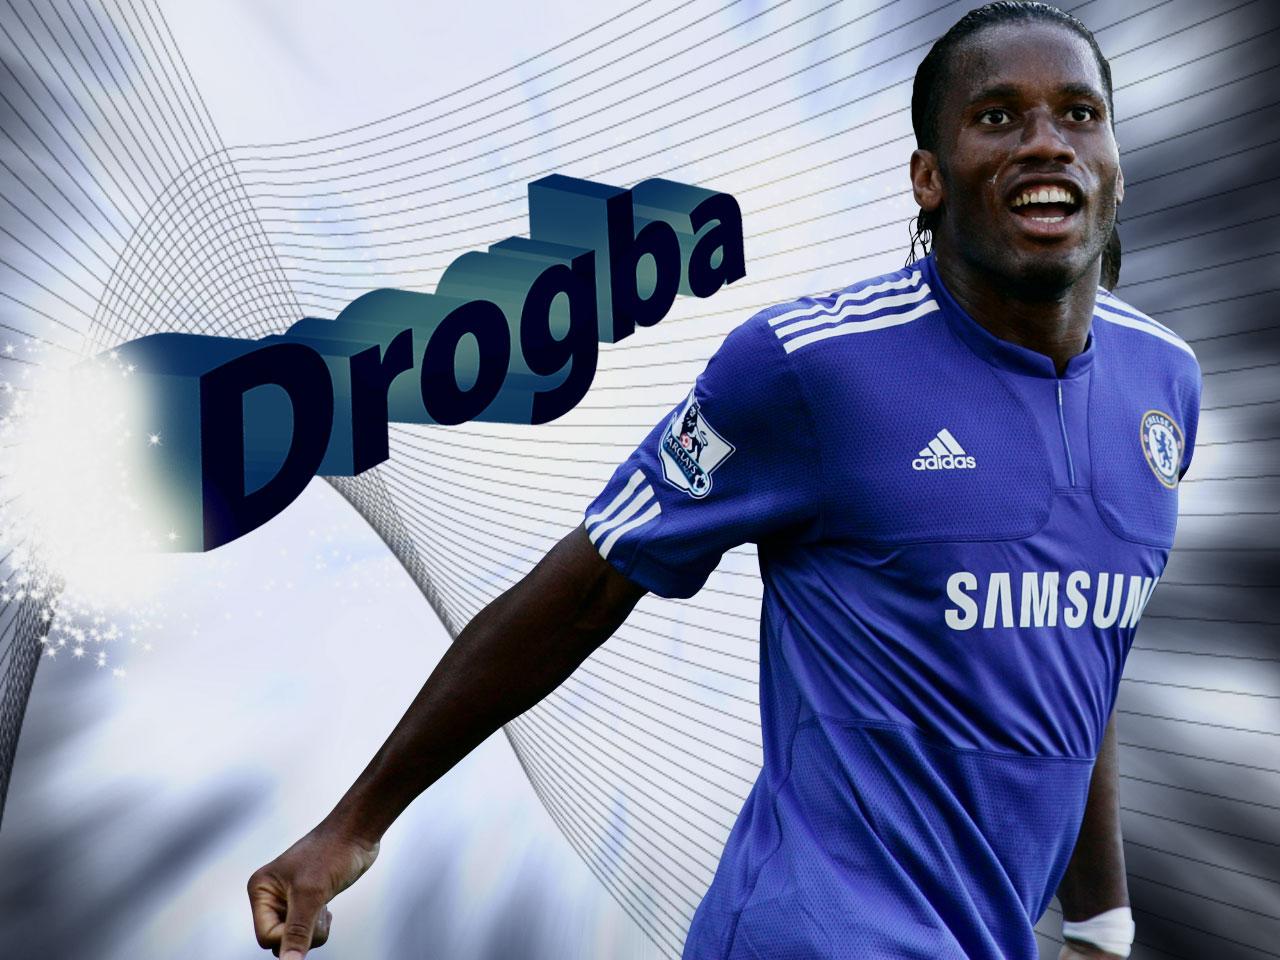 http://2.bp.blogspot.com/-Y-Q3nAT9NYY/TfmoIyr_txI/AAAAAAAACyk/oDXmc0rQbJ4/s1600/Didier%2BDrogba%2BIvorian%2Bfootballer%2Bwallpapers.jpg